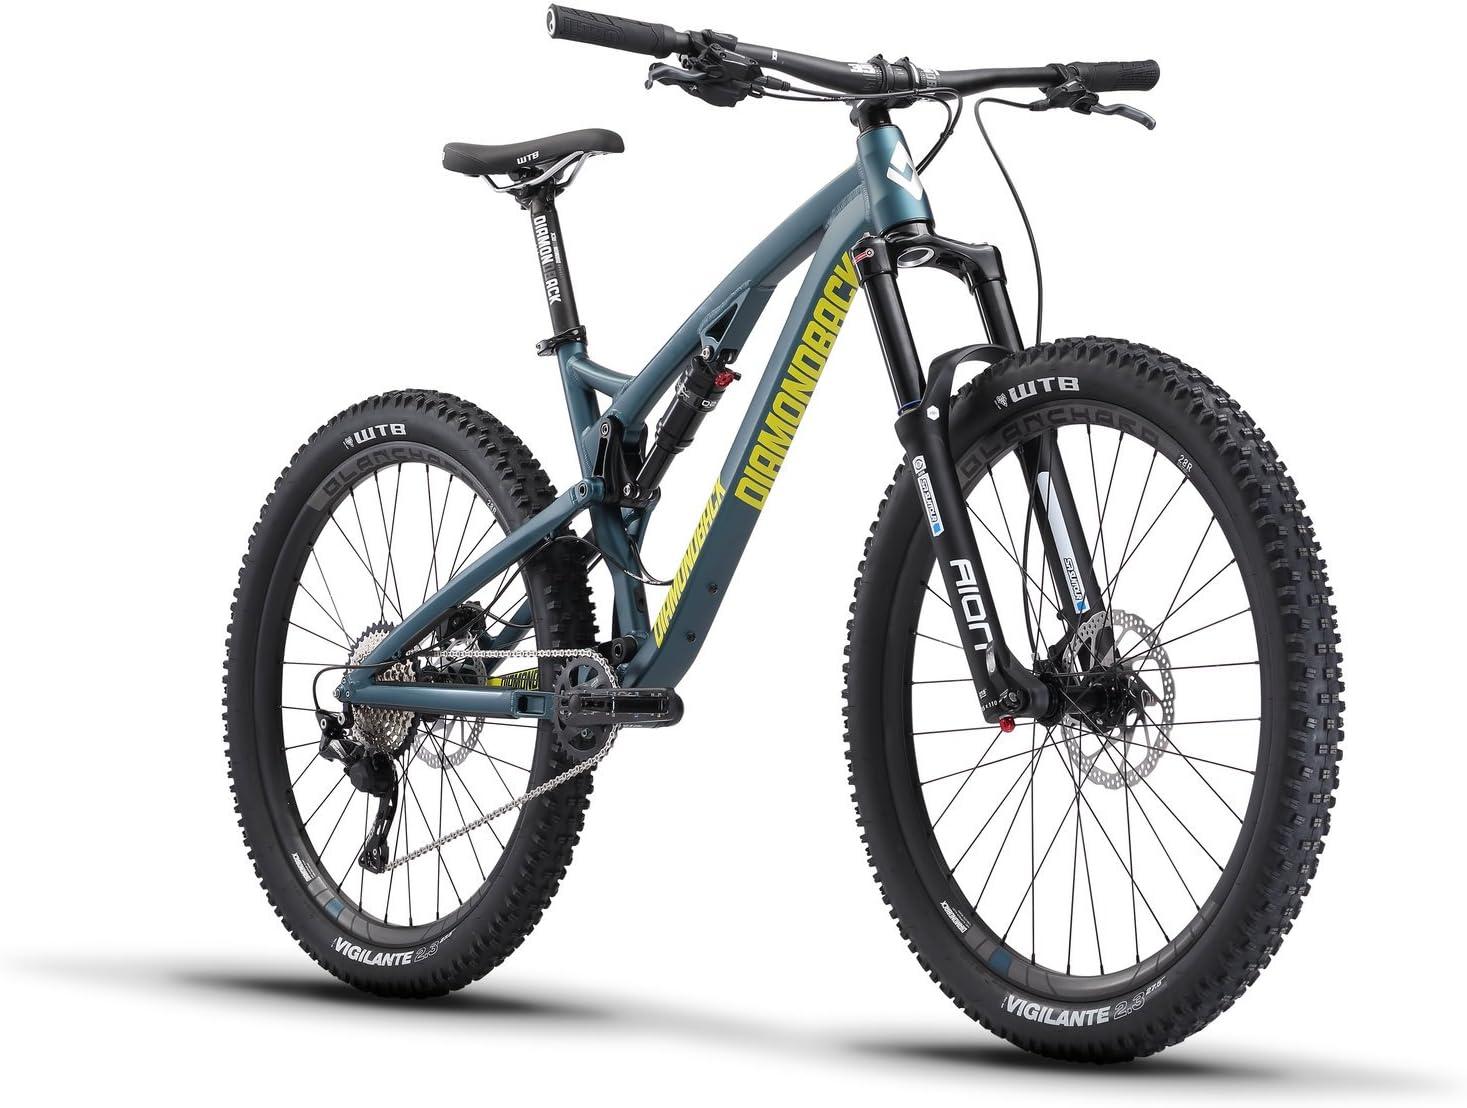 Diamondback Bicycles Release 1 Full Suspension Mountain Bike Best full suspension mountain bike under 2000